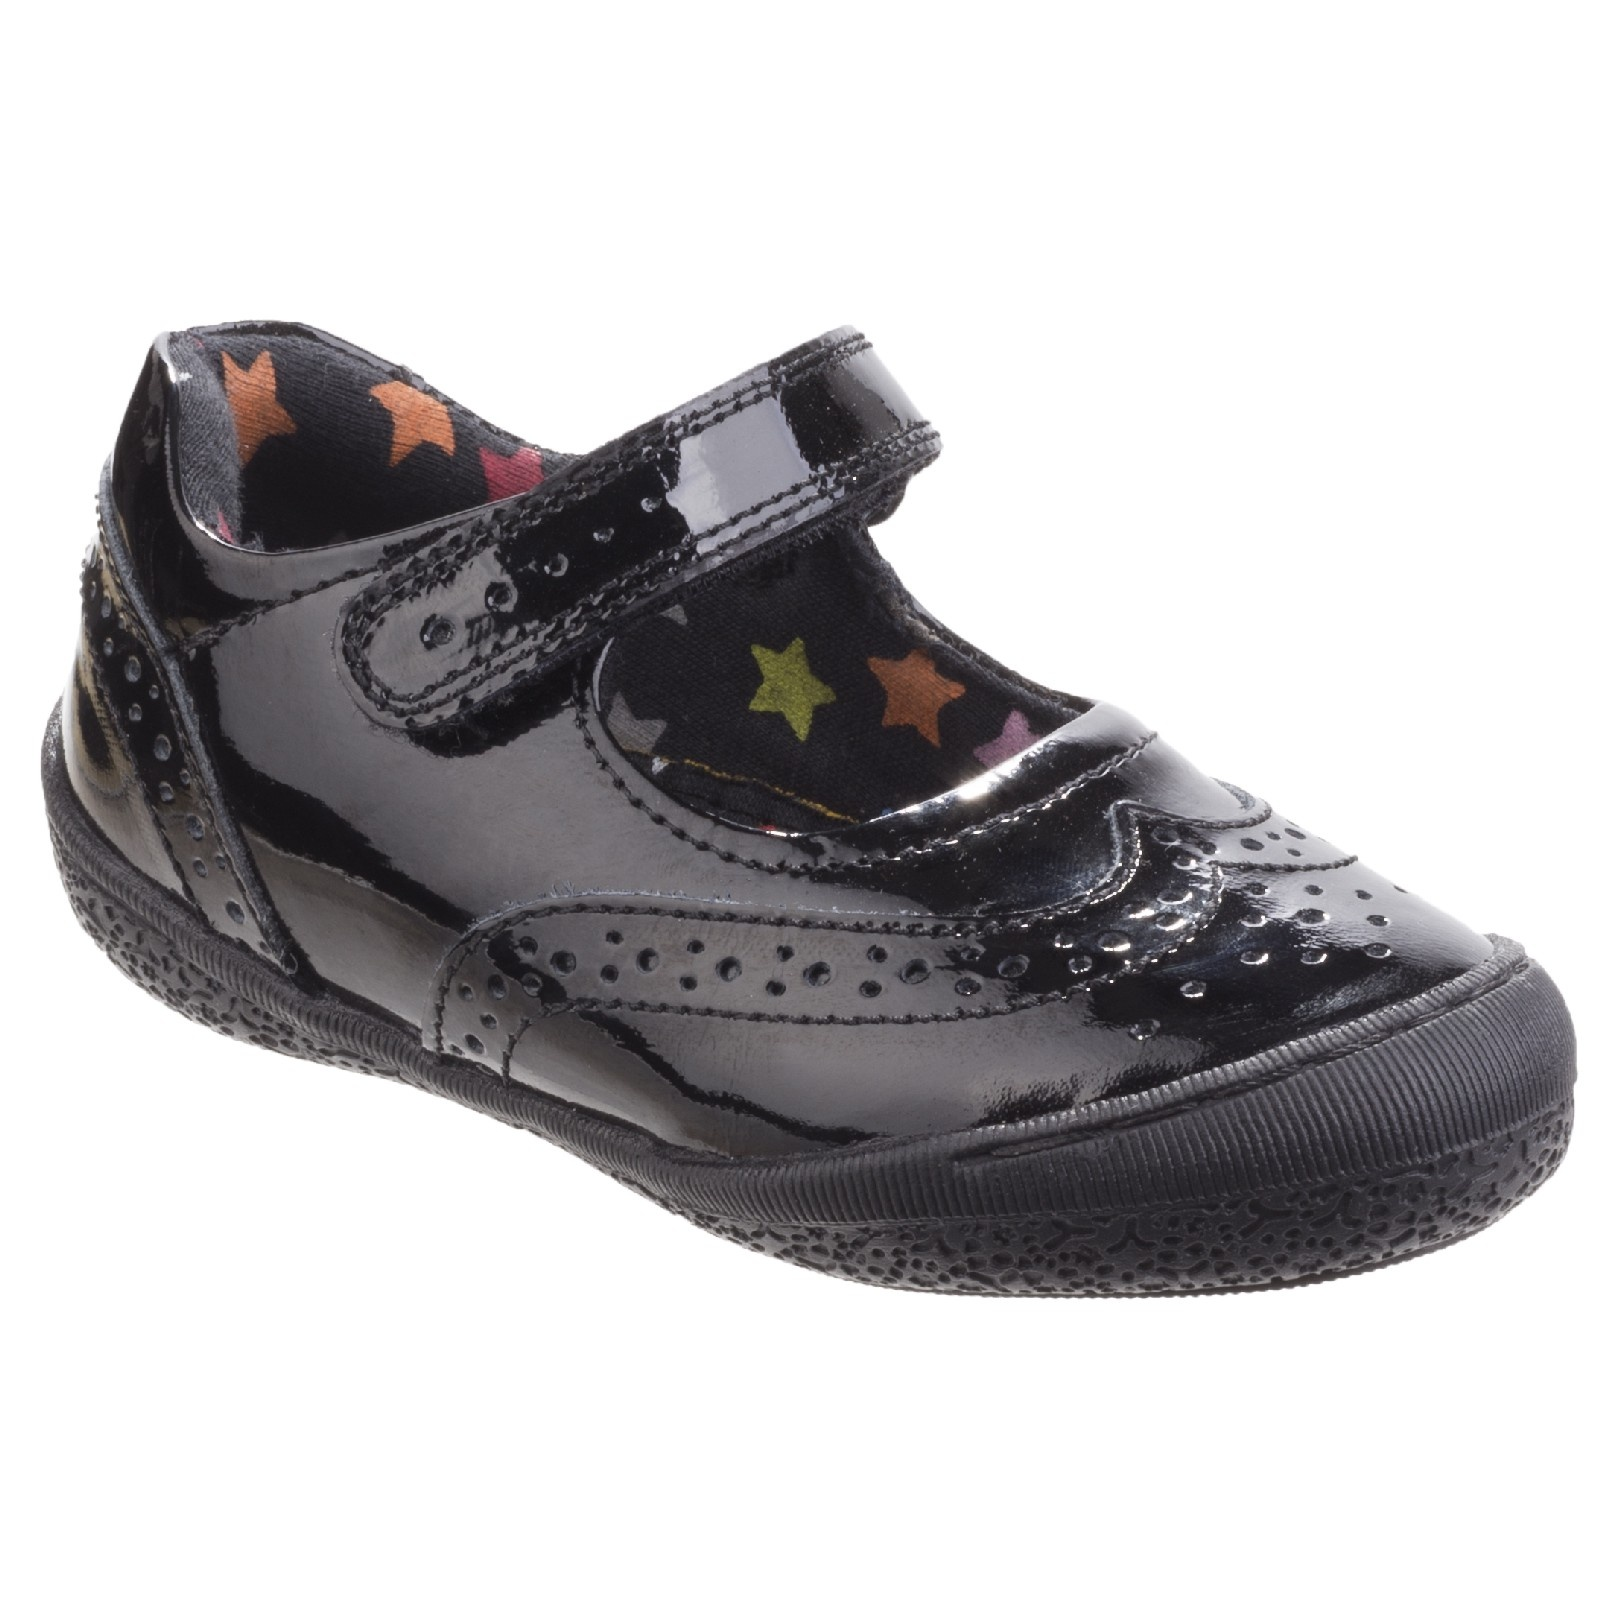 Hush Puppies Childrens Girls Rina Back To School Shoes (7.5 Child UK) (Black)